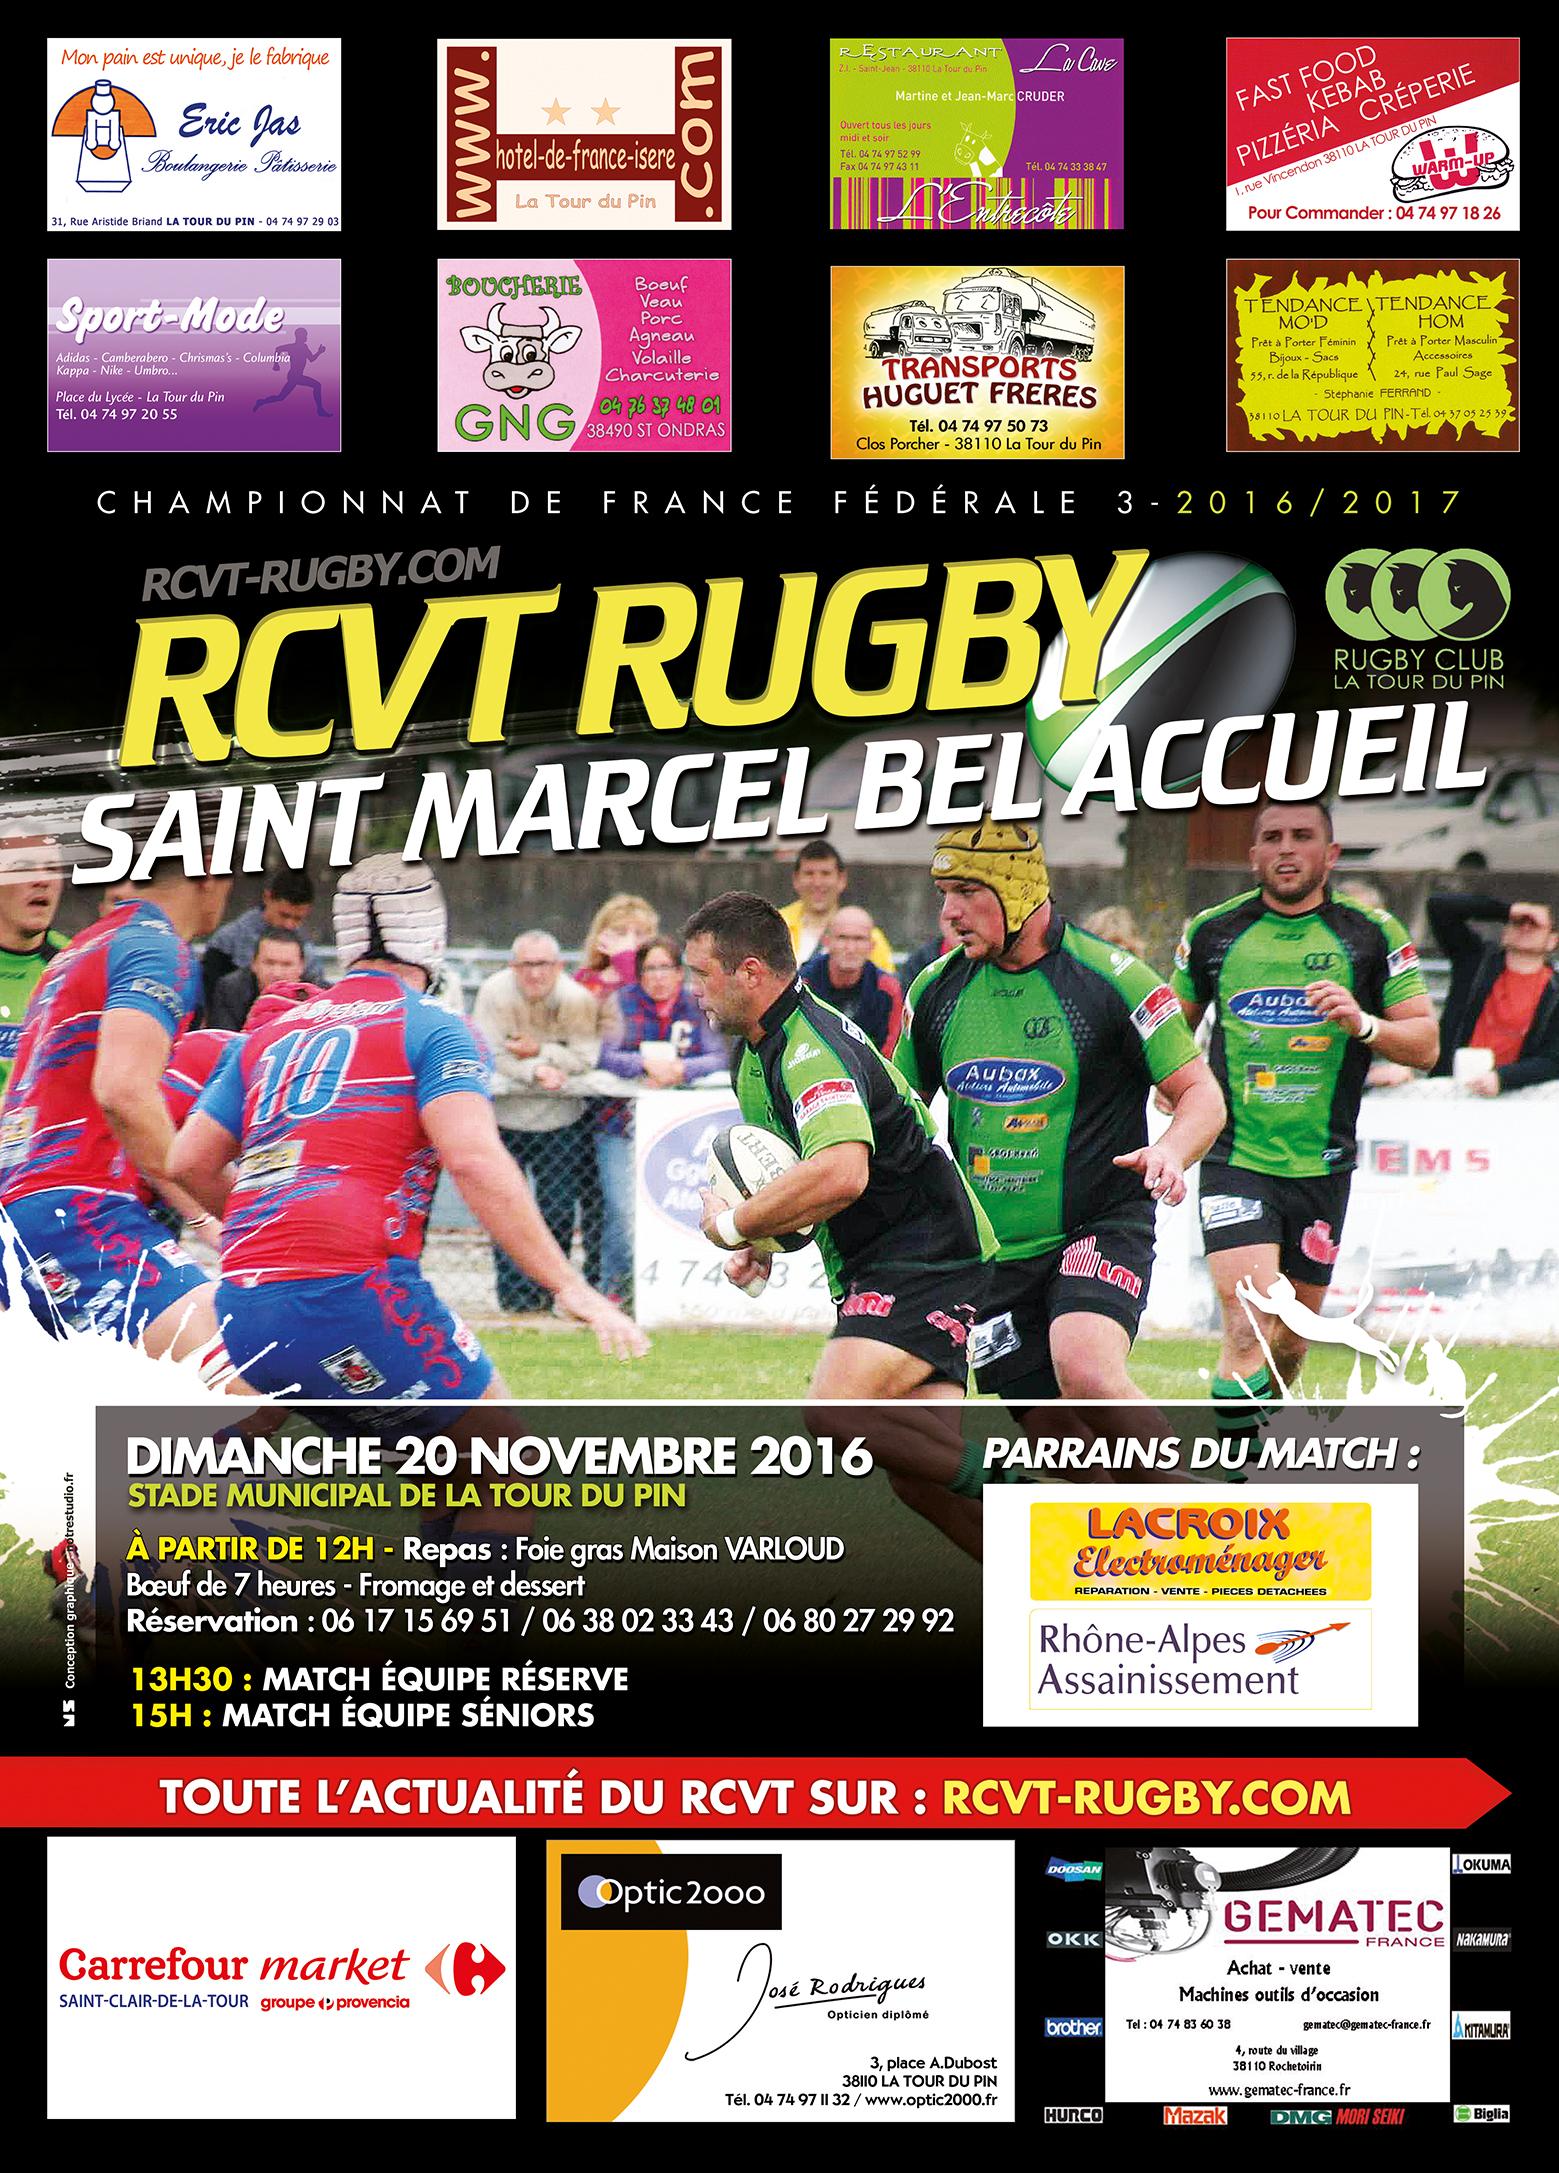 Match rugby : RCVT vs ST MARCEL BEL ACCUEIL.